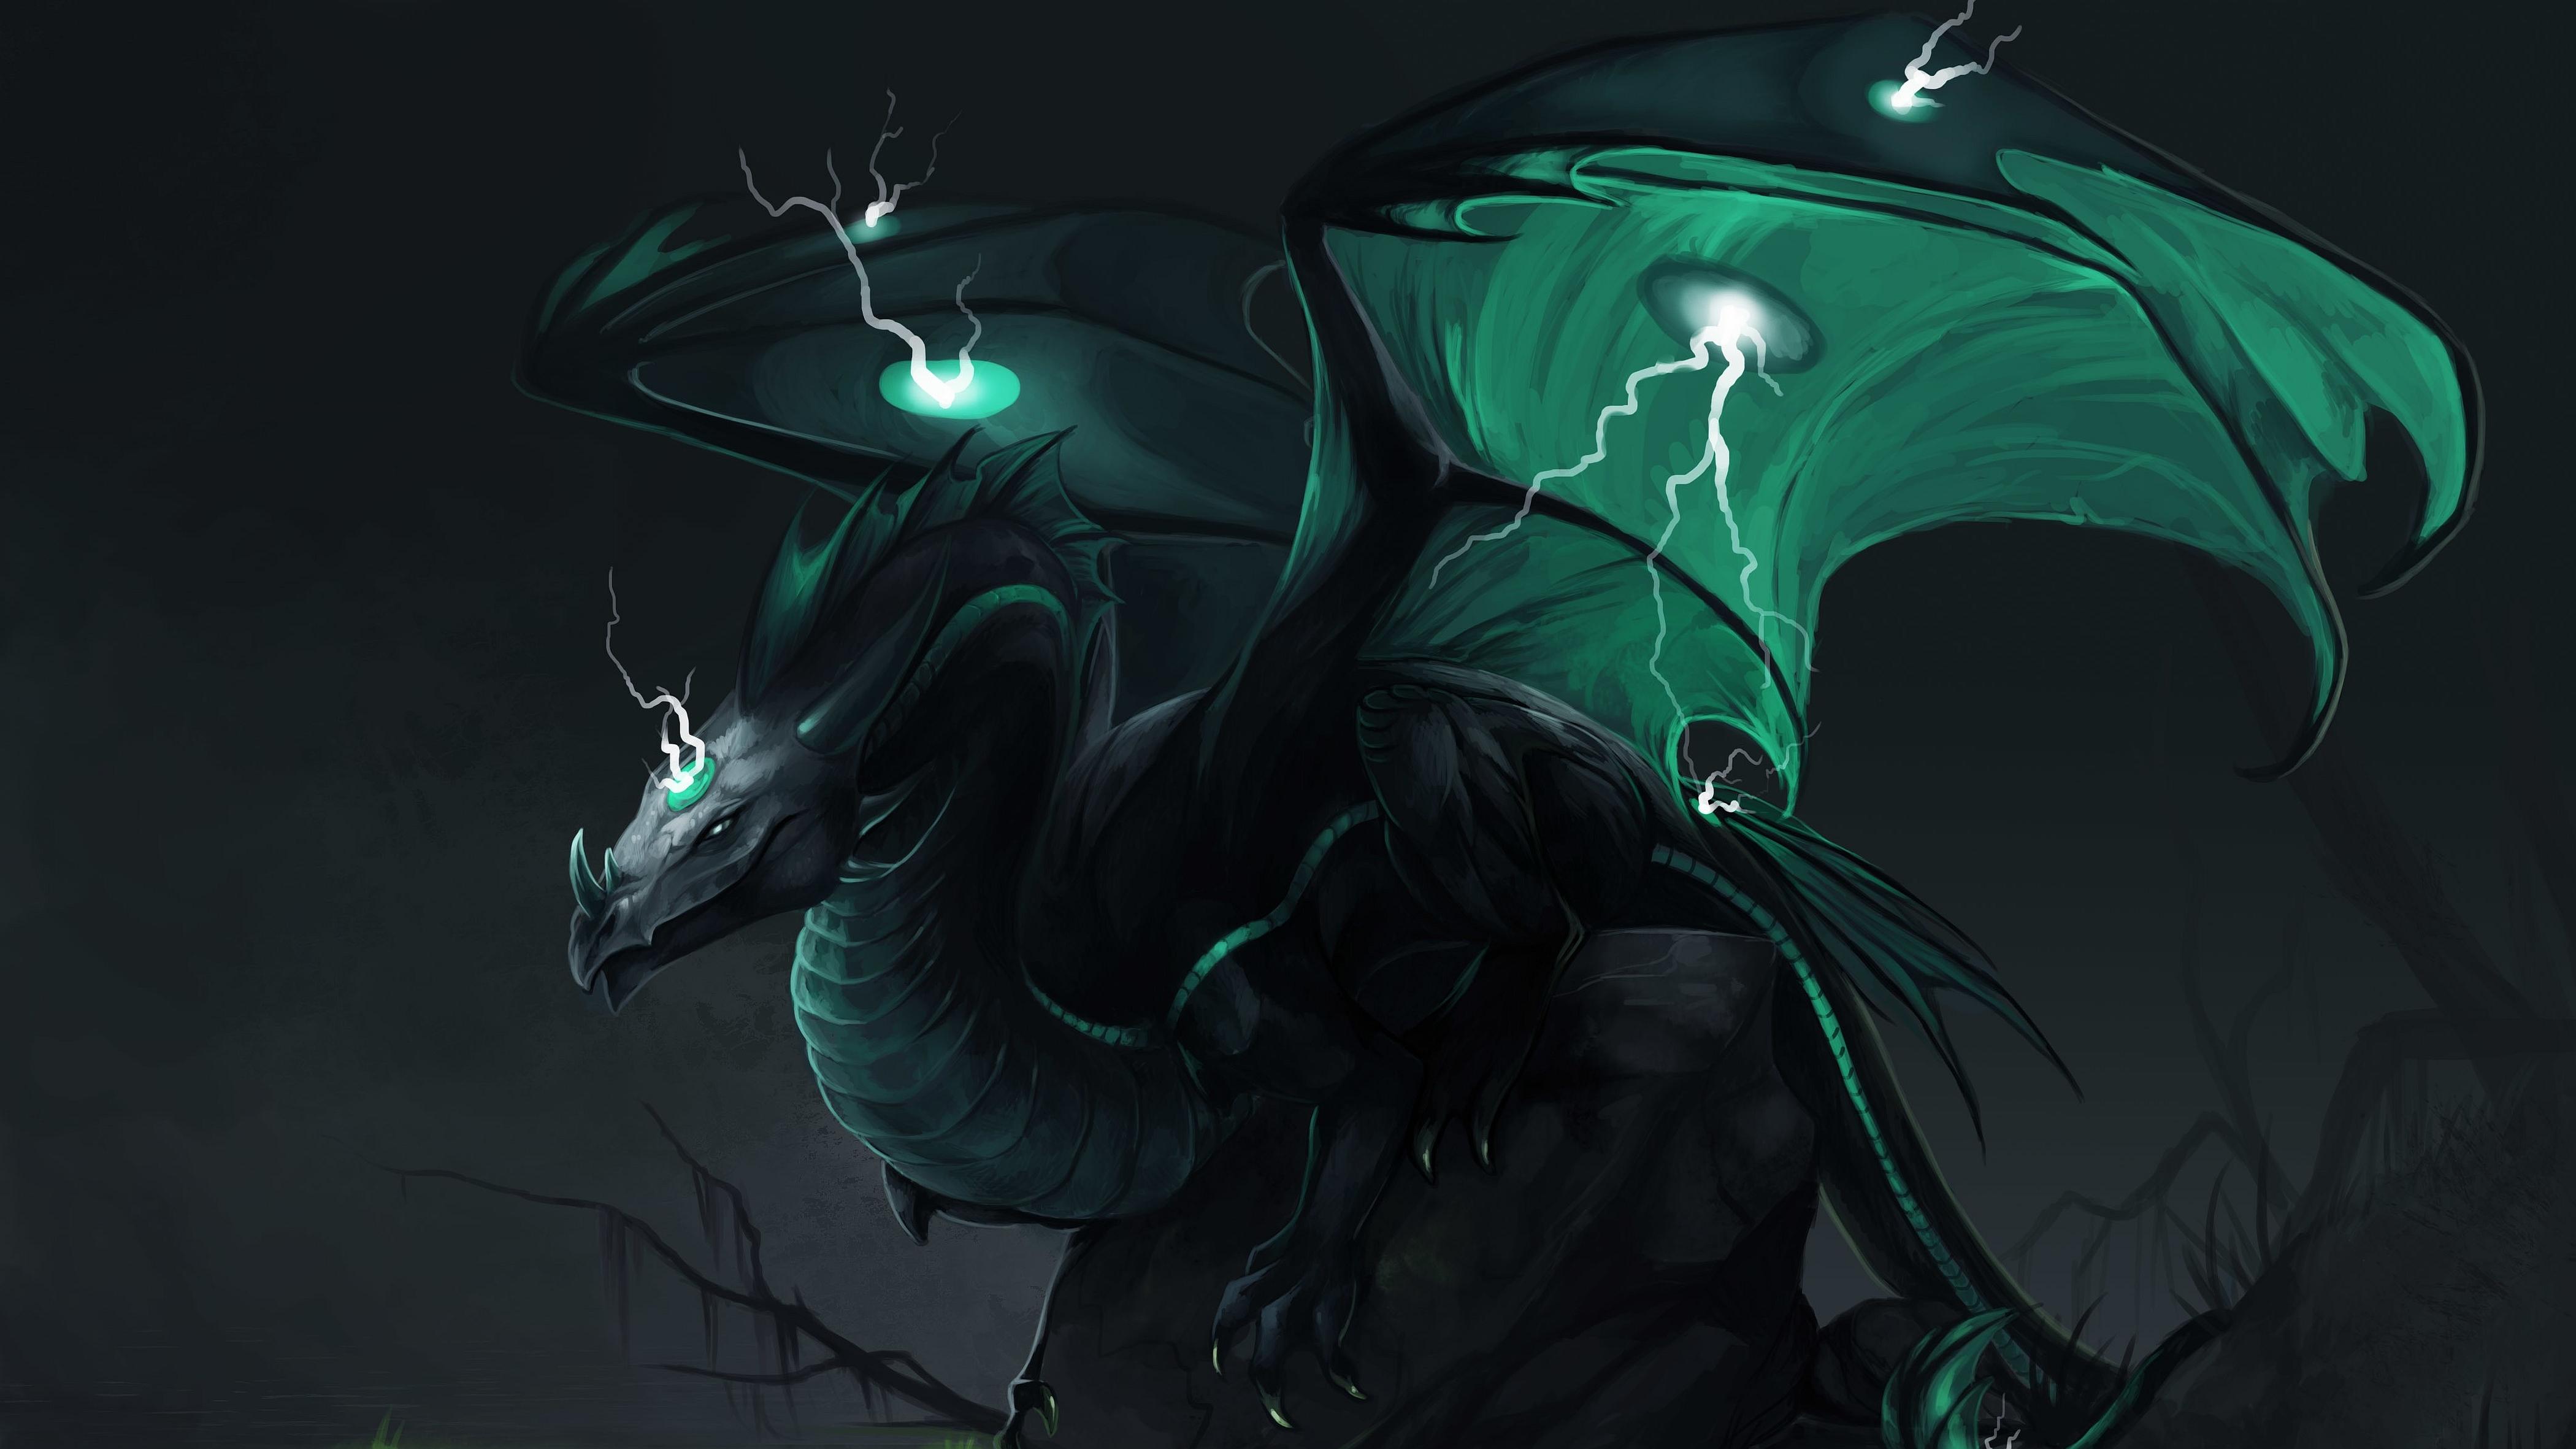 download green dragon fantasy hd wallpaper search more high definition 4200x2362